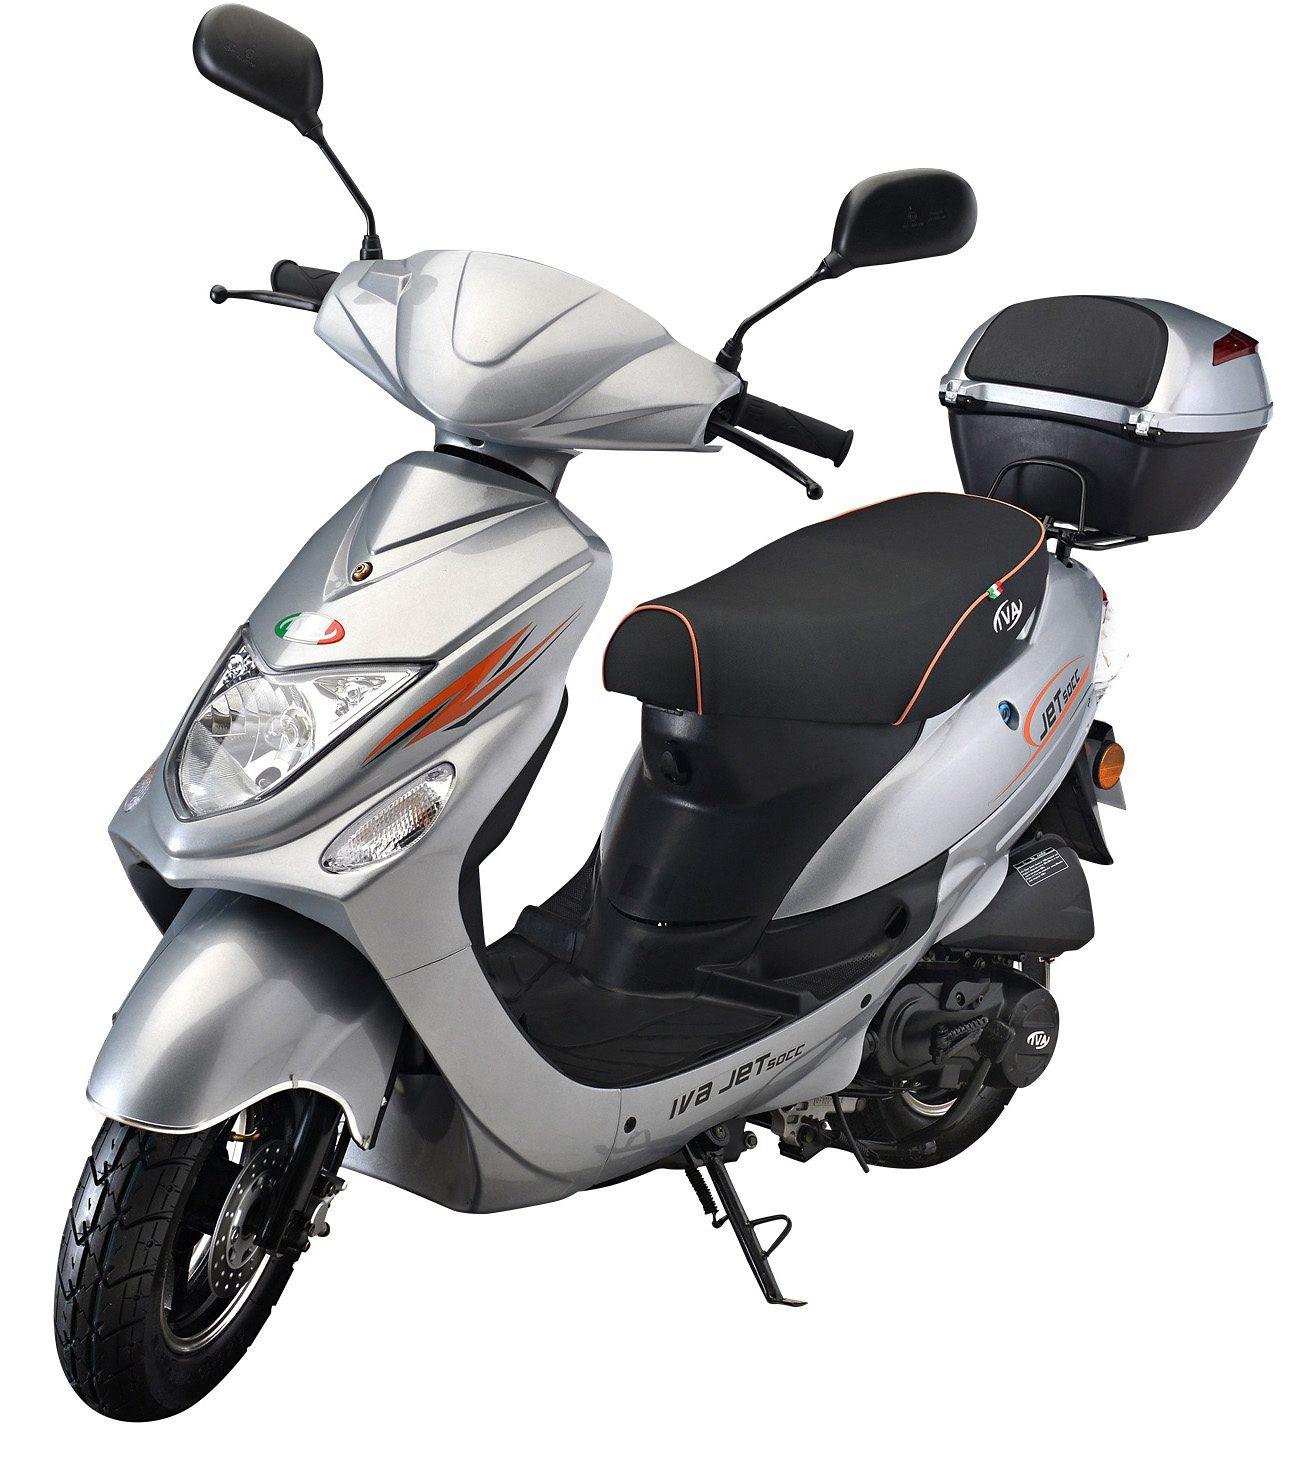 IVA Mofaroller inkl. Topcase, 49 ccm, 25 km/h, silber, »Jet New«